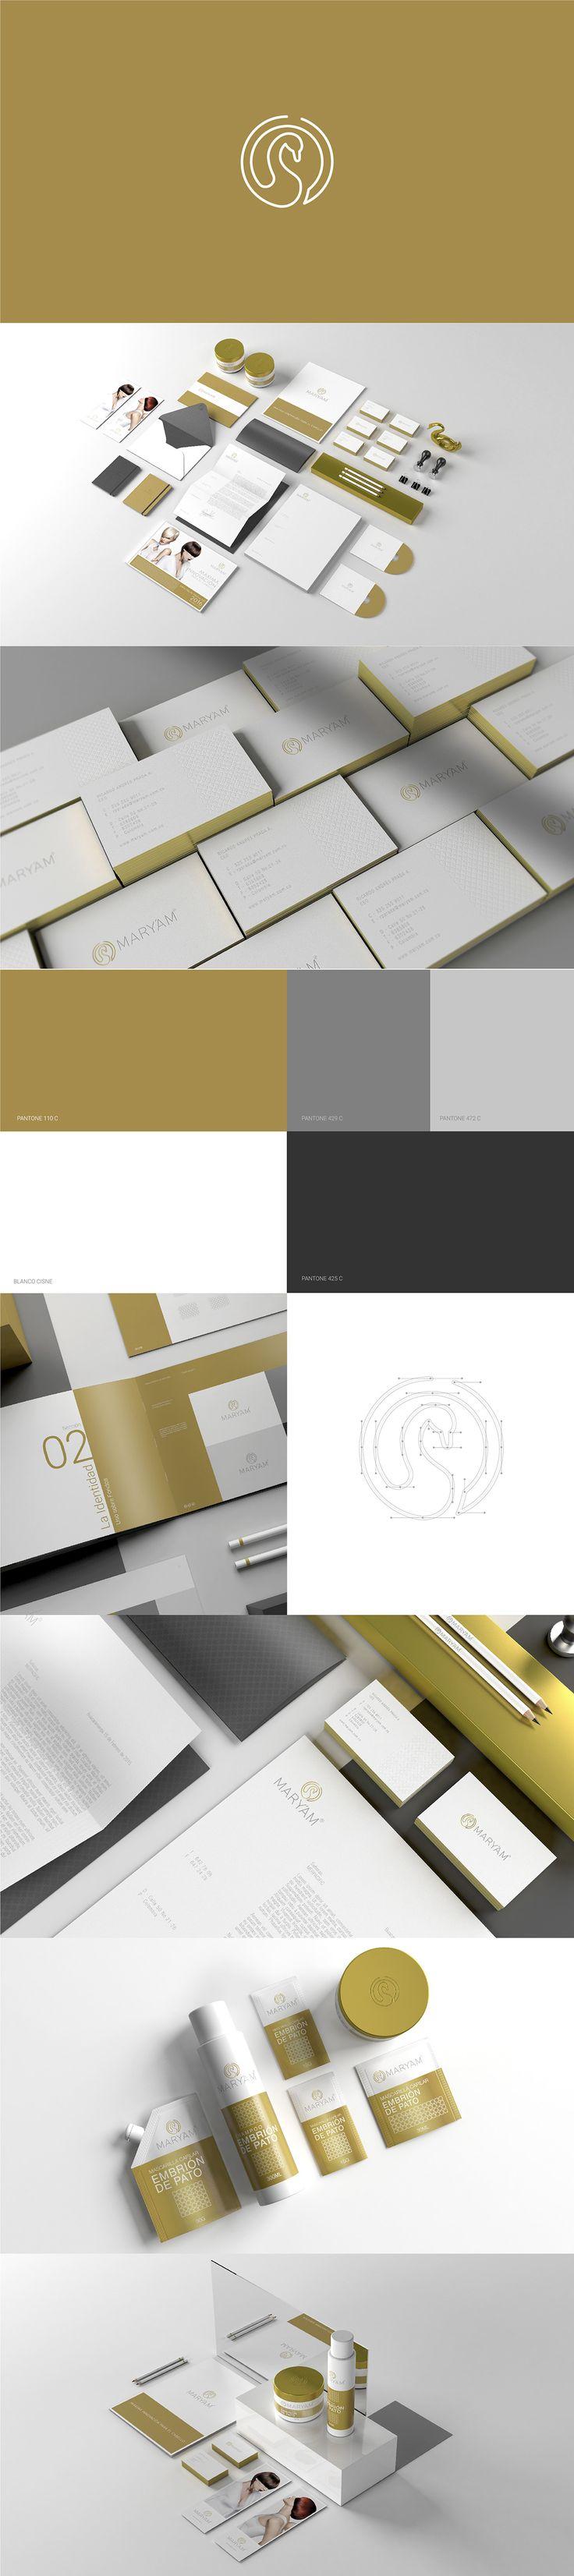 branding, logo, identity, packaging